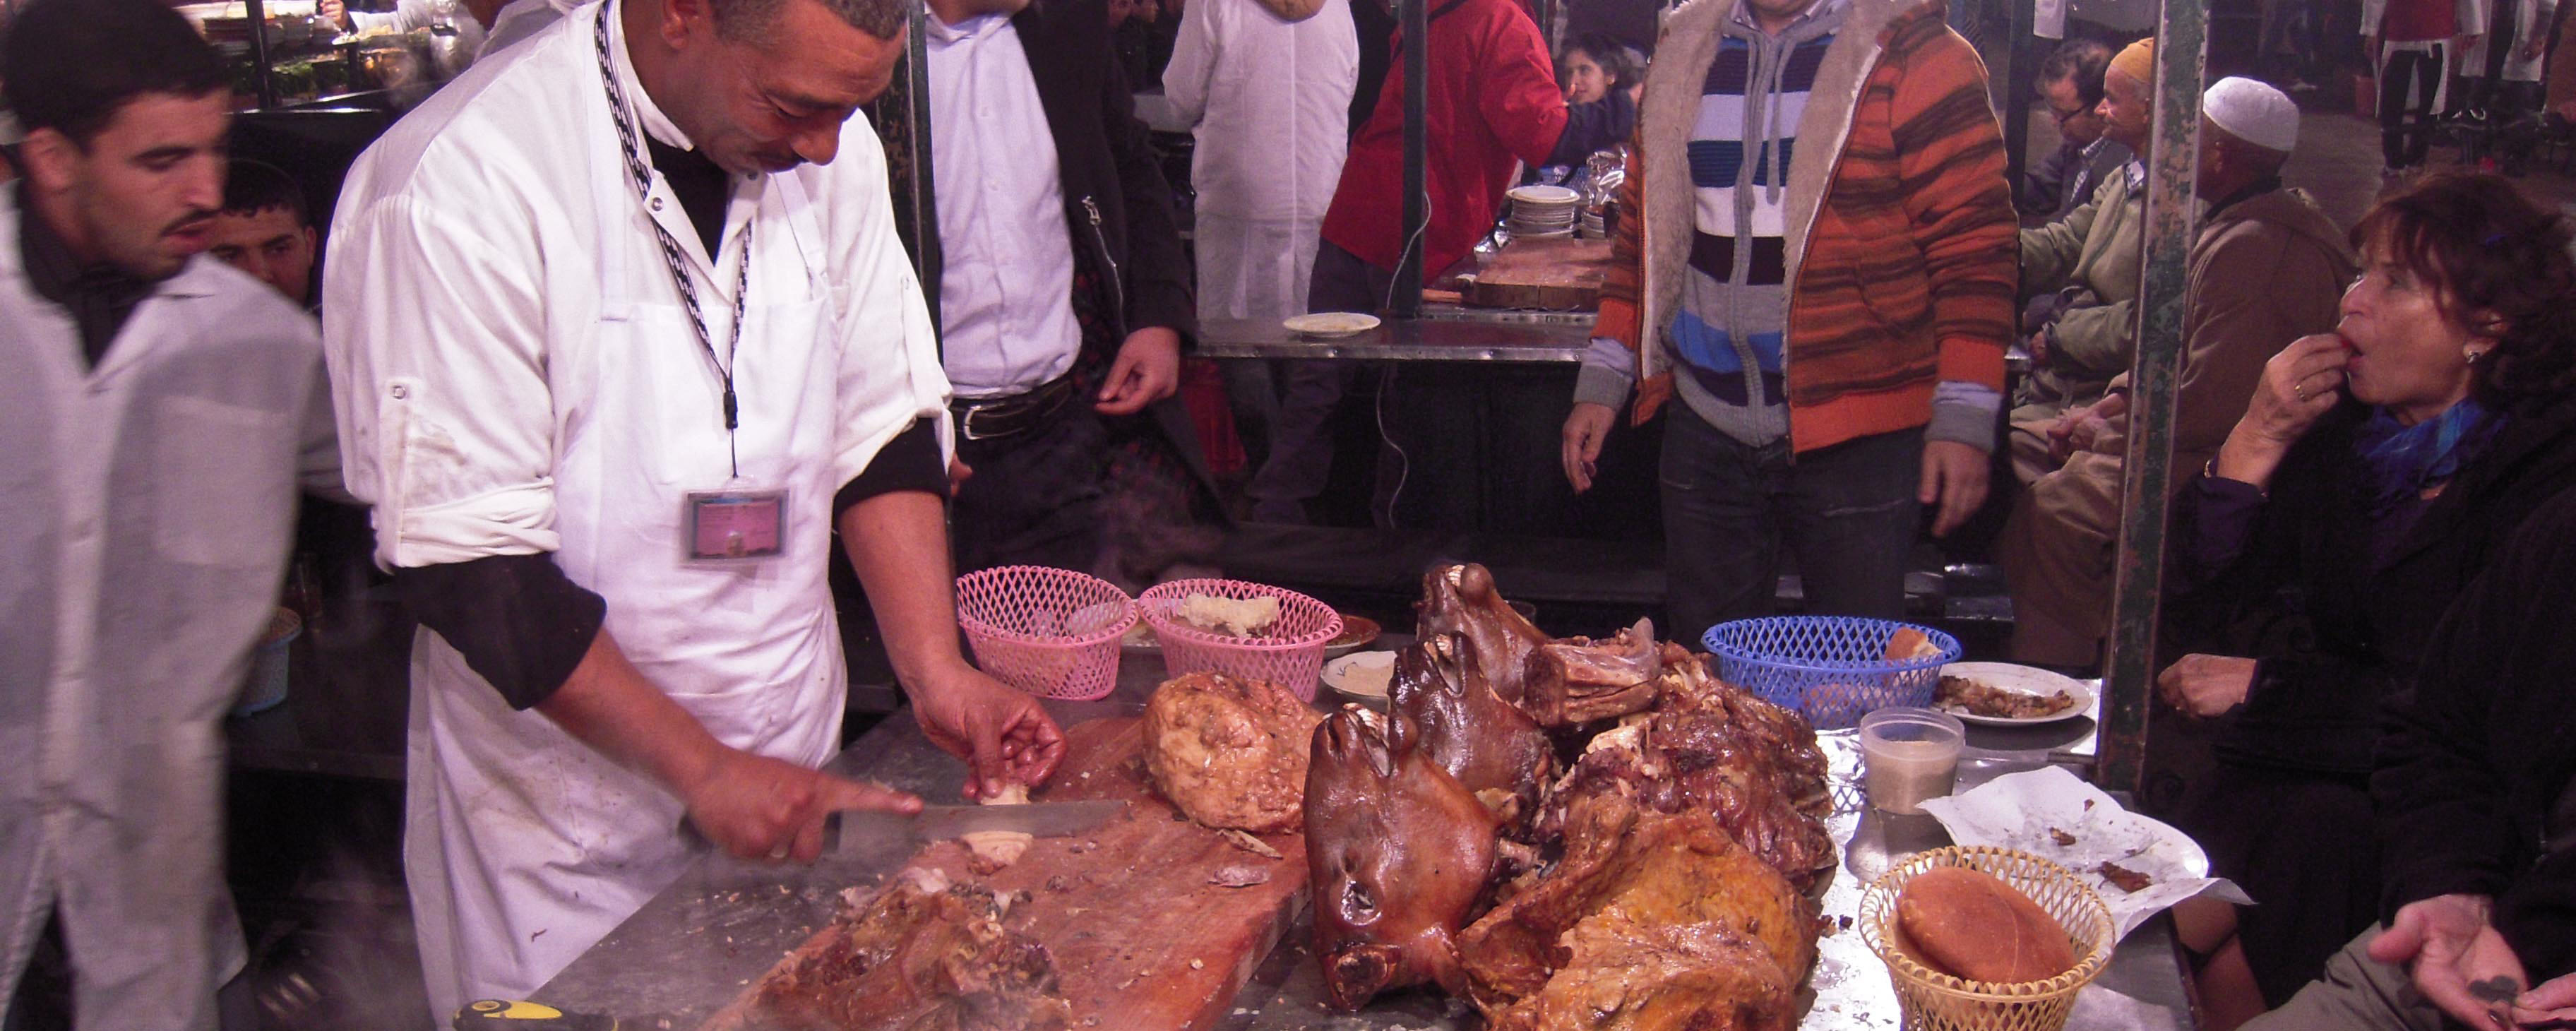 A_food_stall,_Djemma_el_Fna,_Marrakesh_(5367527033)